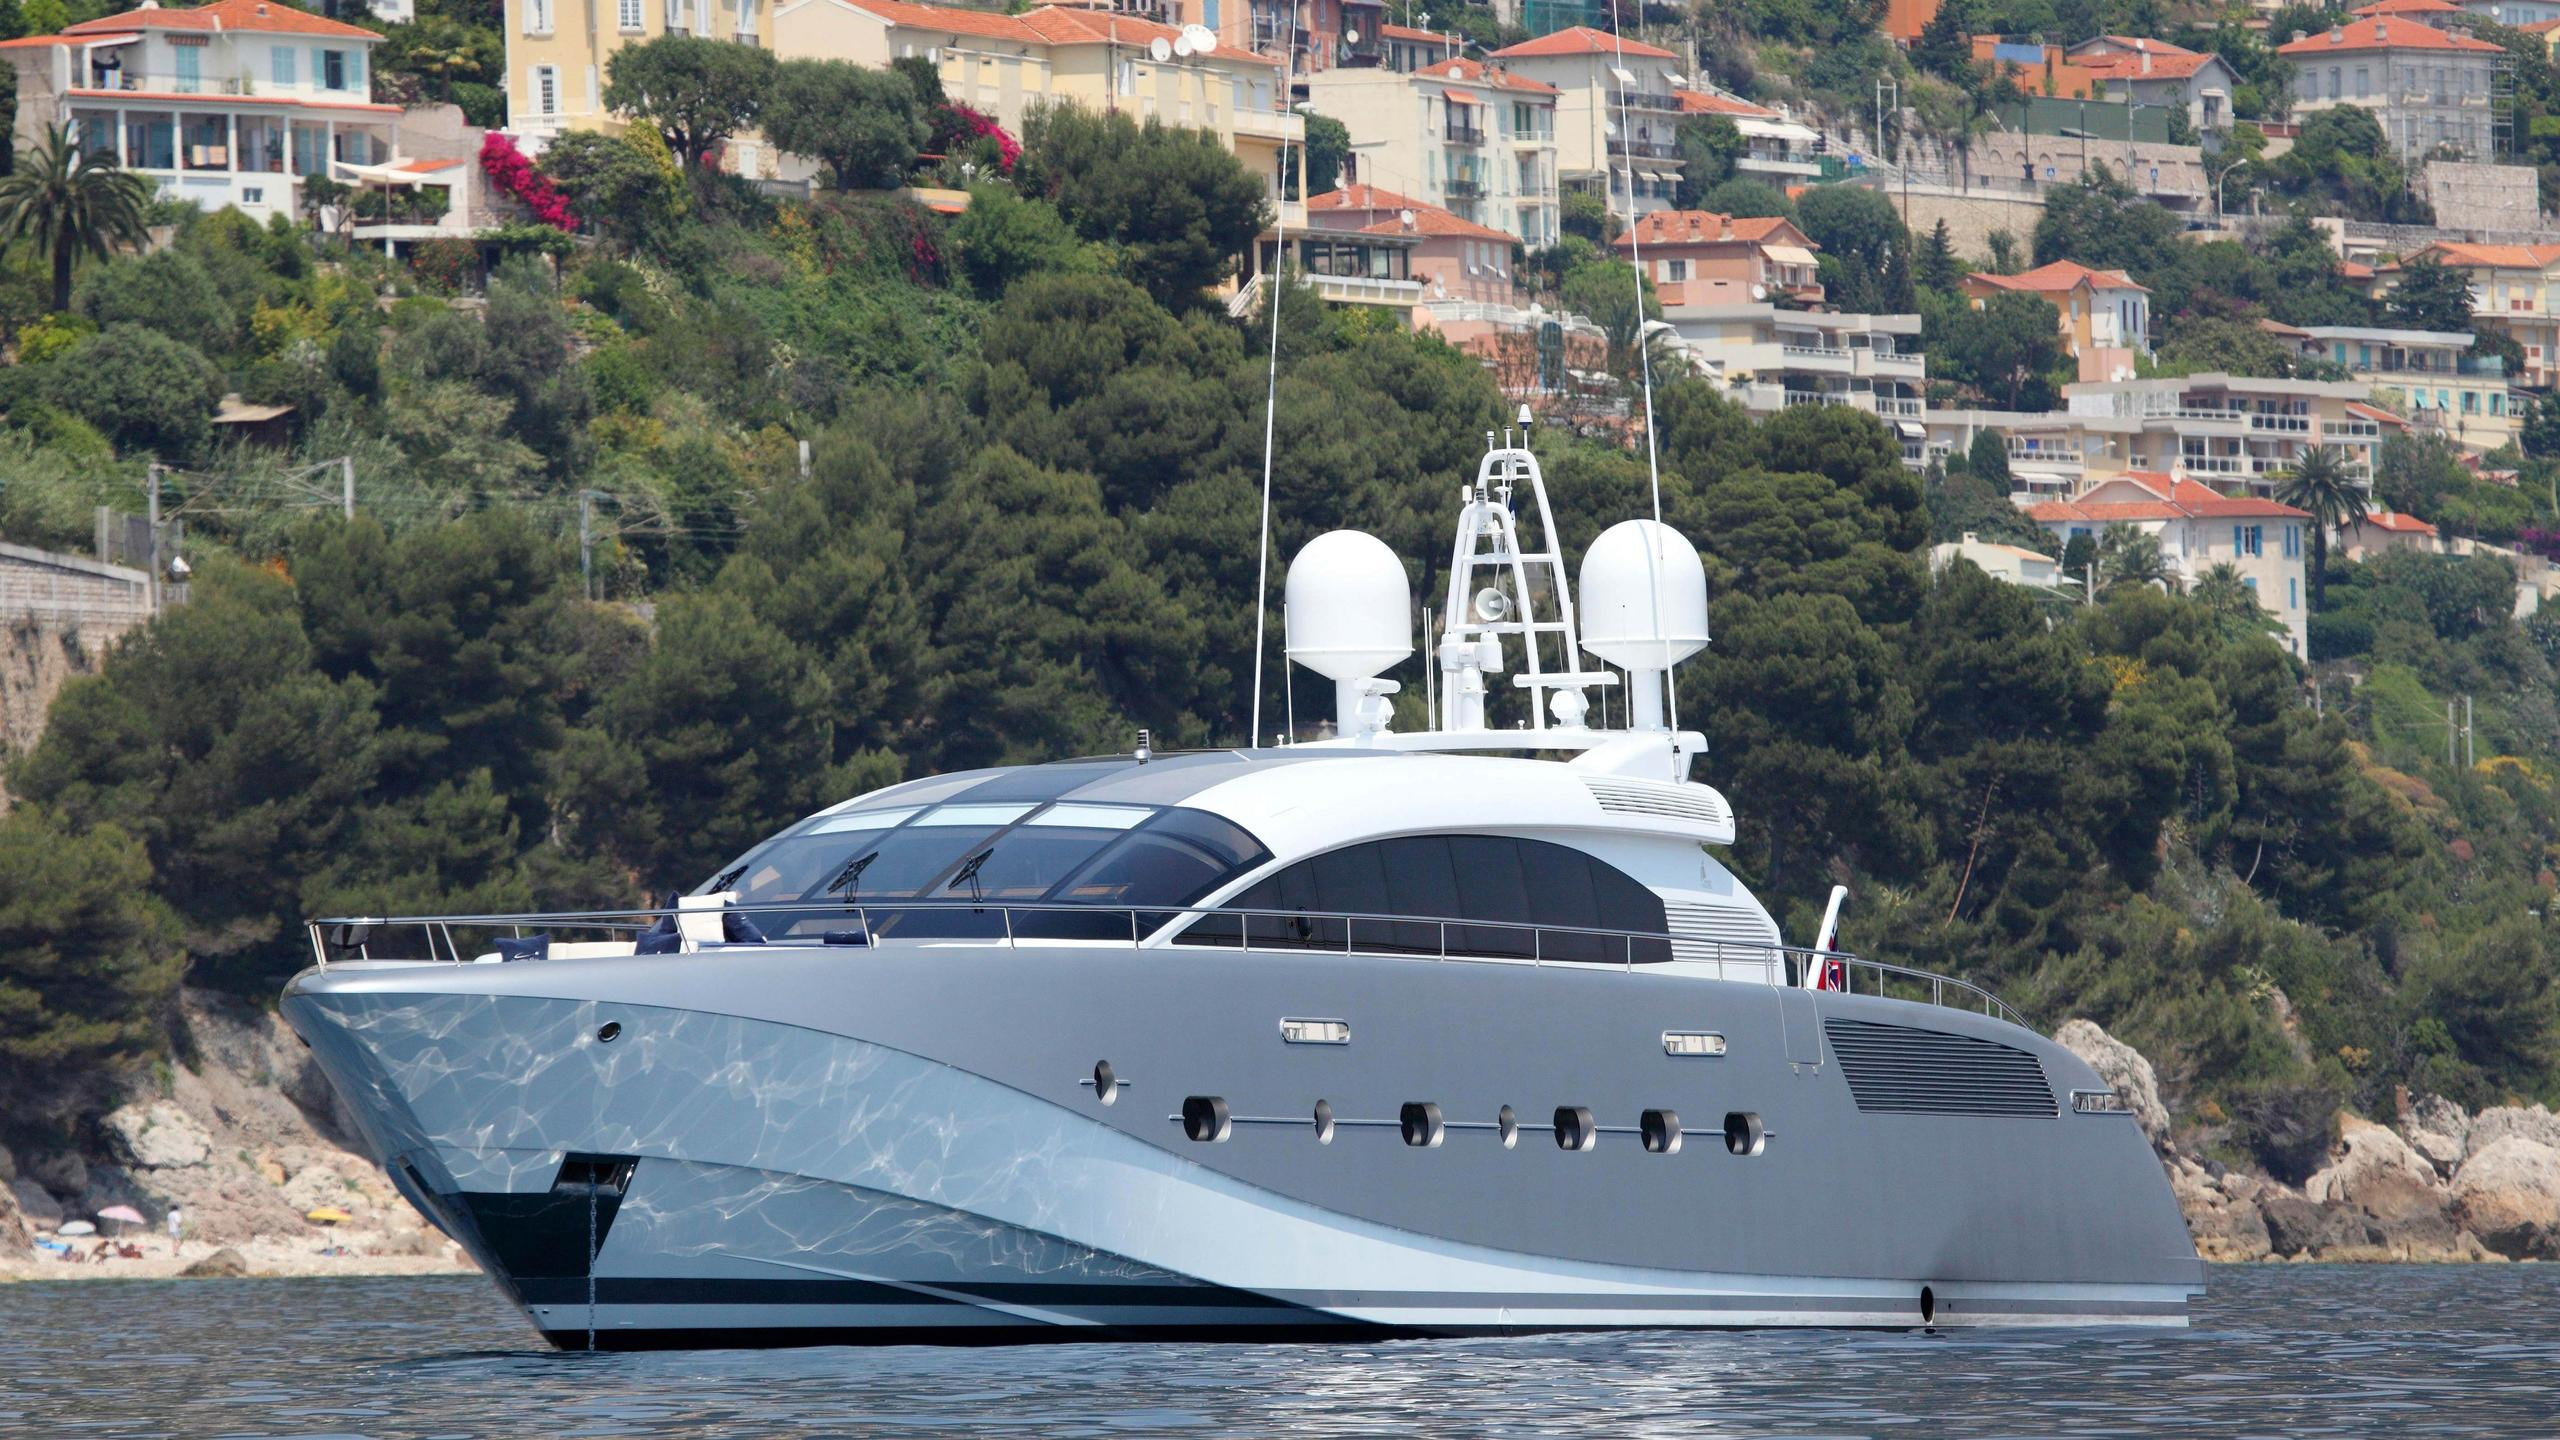 butterfly-motor-yacht-danish-2011-38m-half-profile-moored